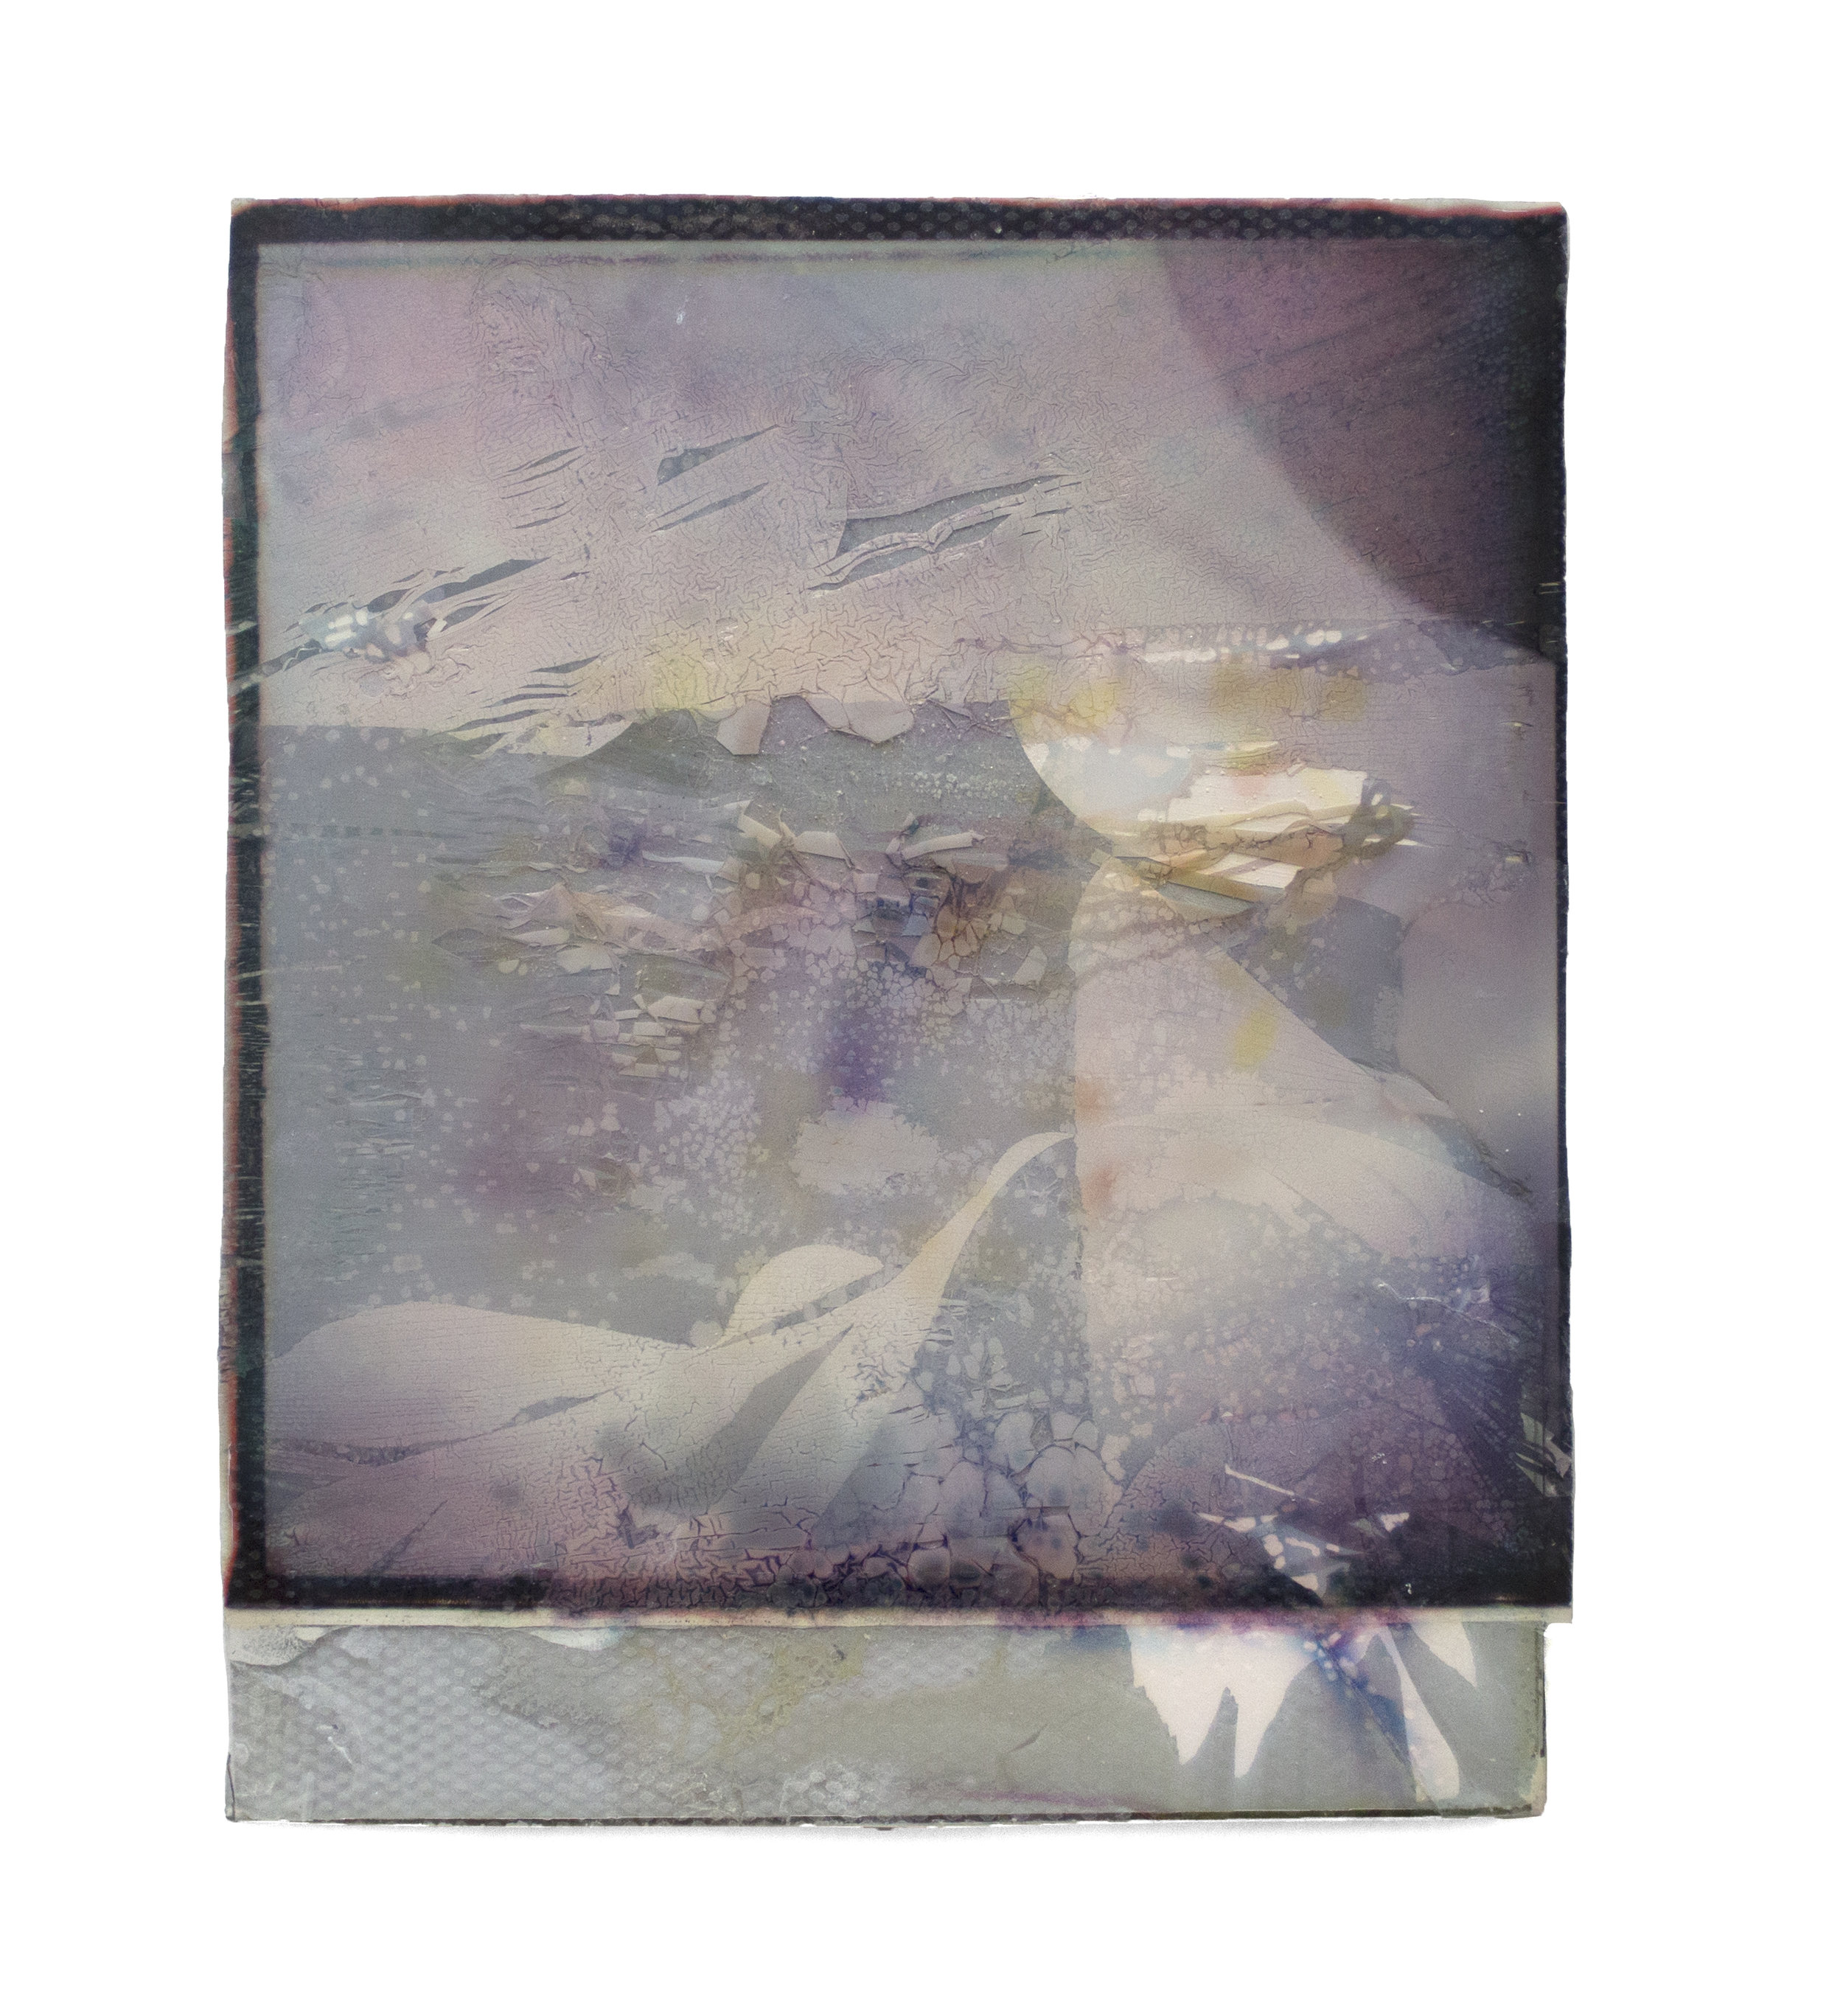 "Purple stalks greeting    Polaroid collage  3"" x 3 3/4""  2019"